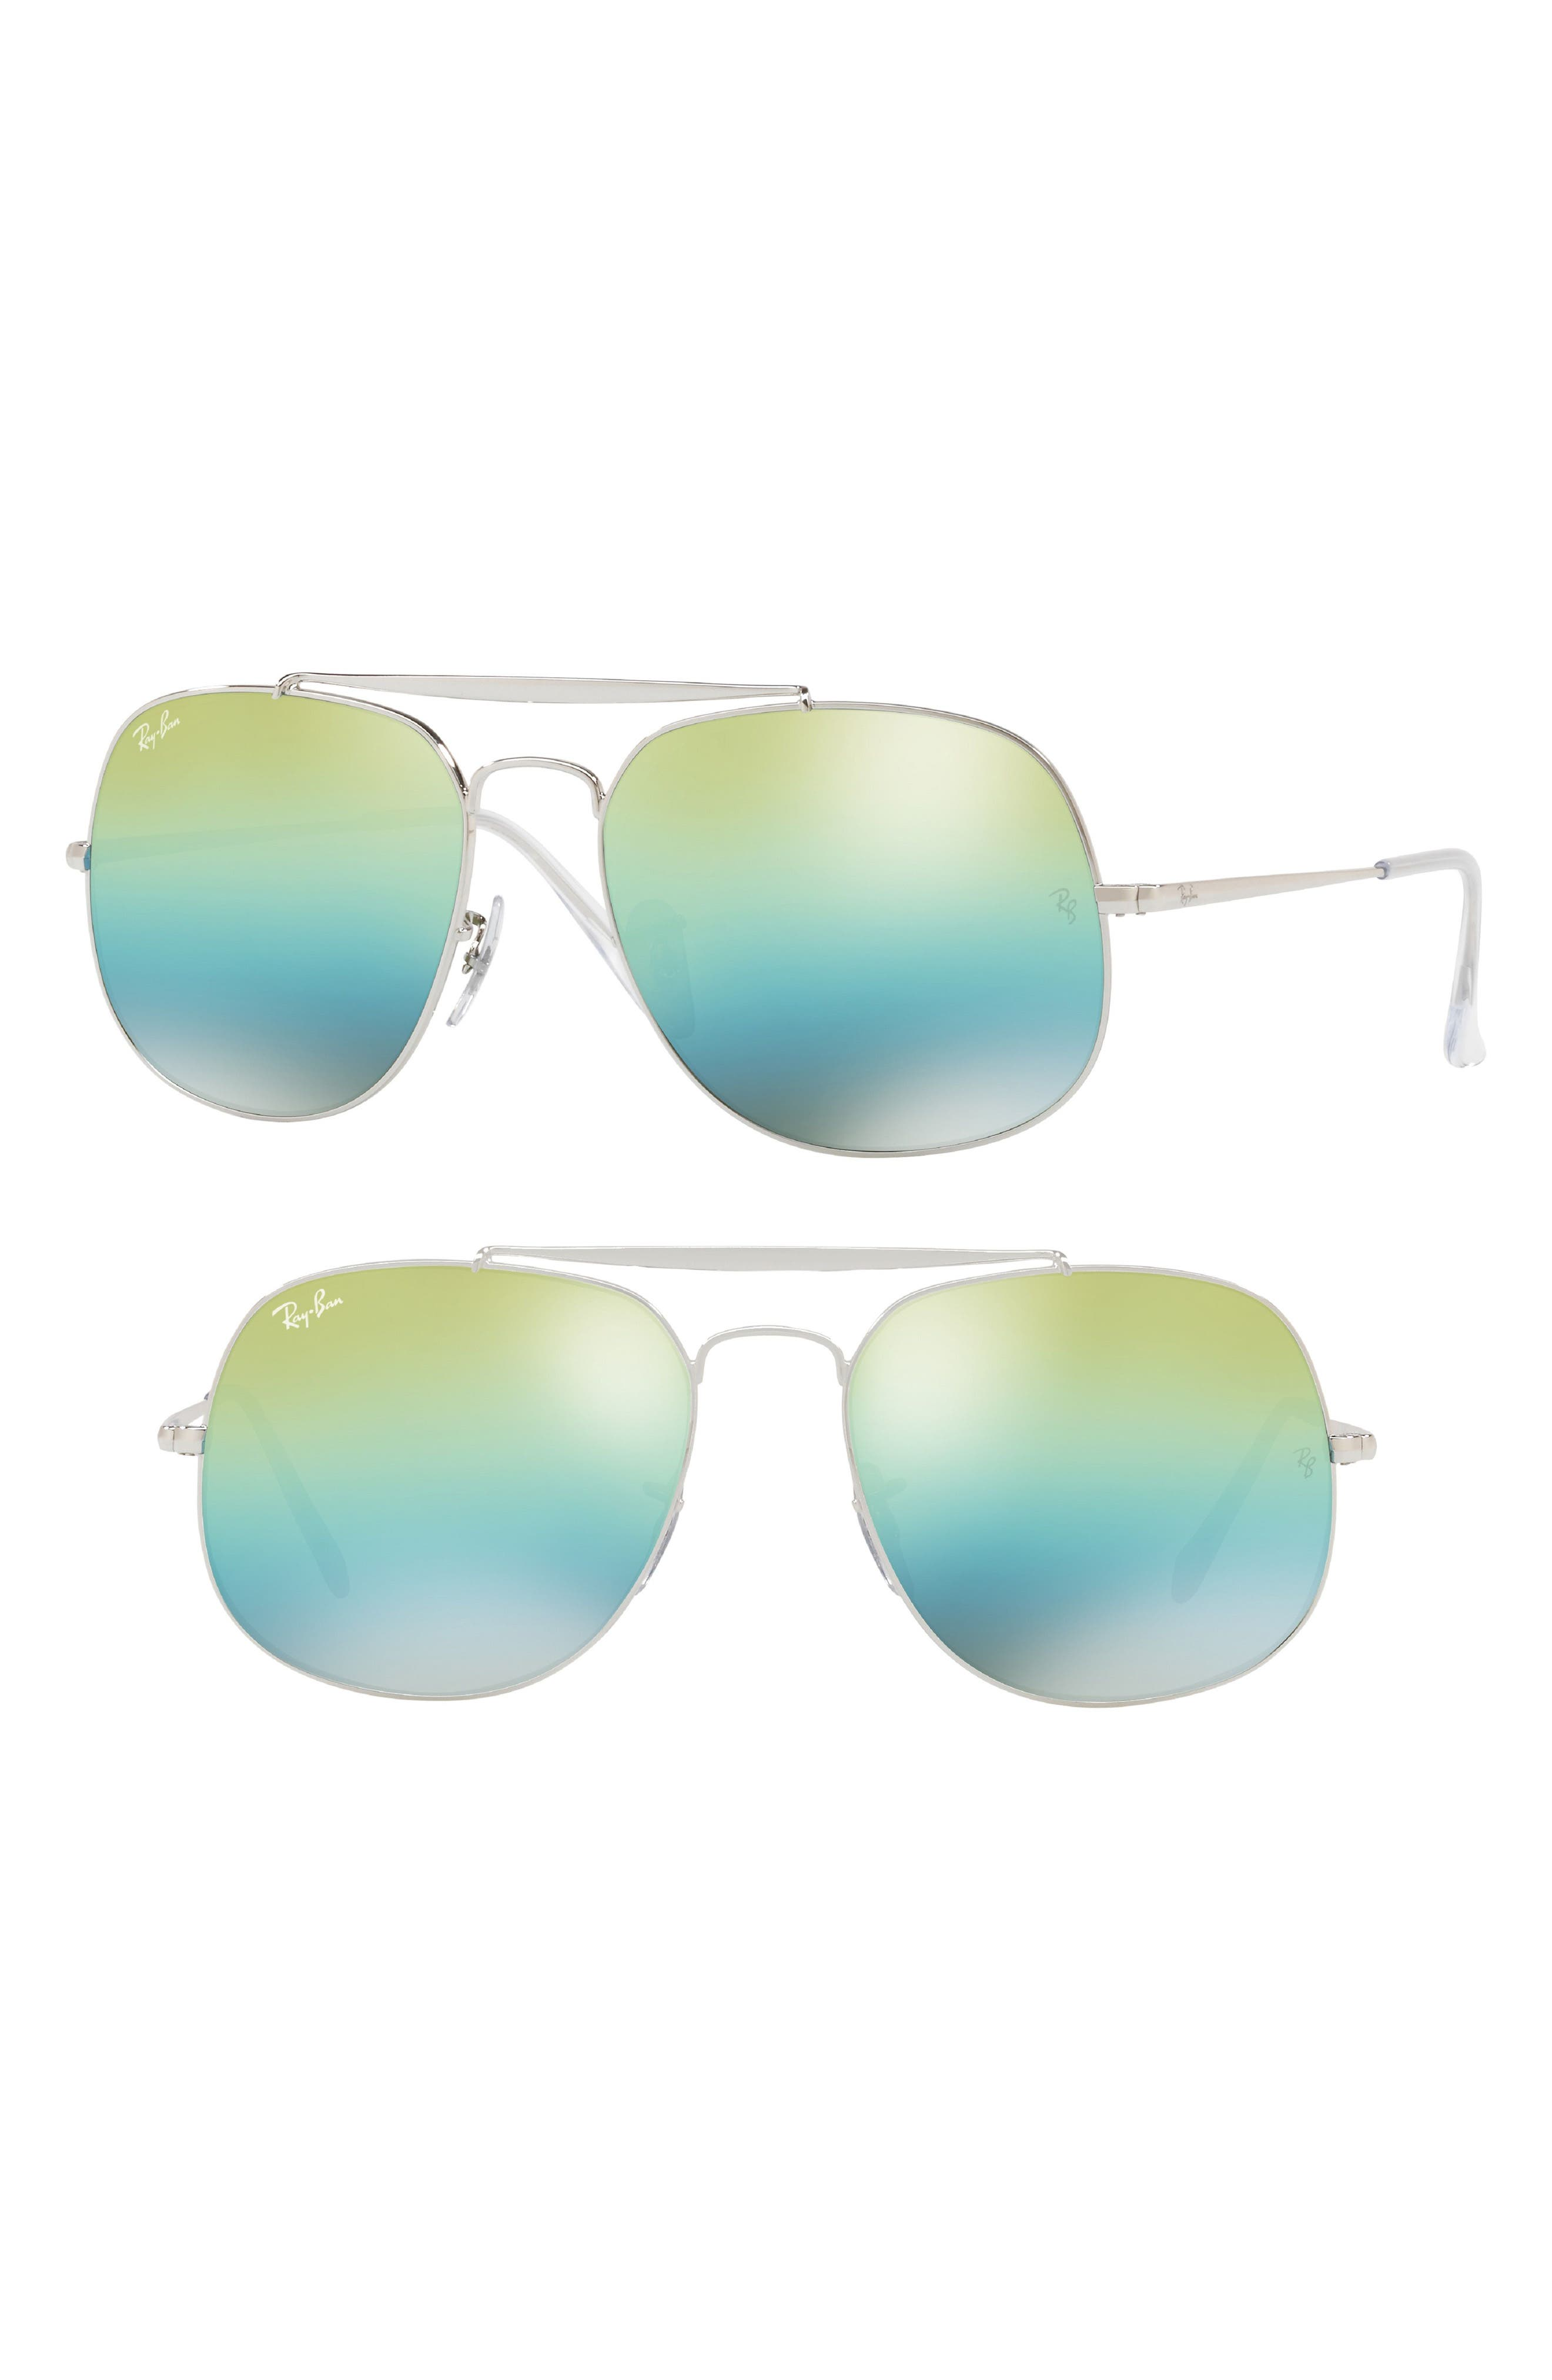 57mm Aviator Sunglasses,                         Main,                         color, 400